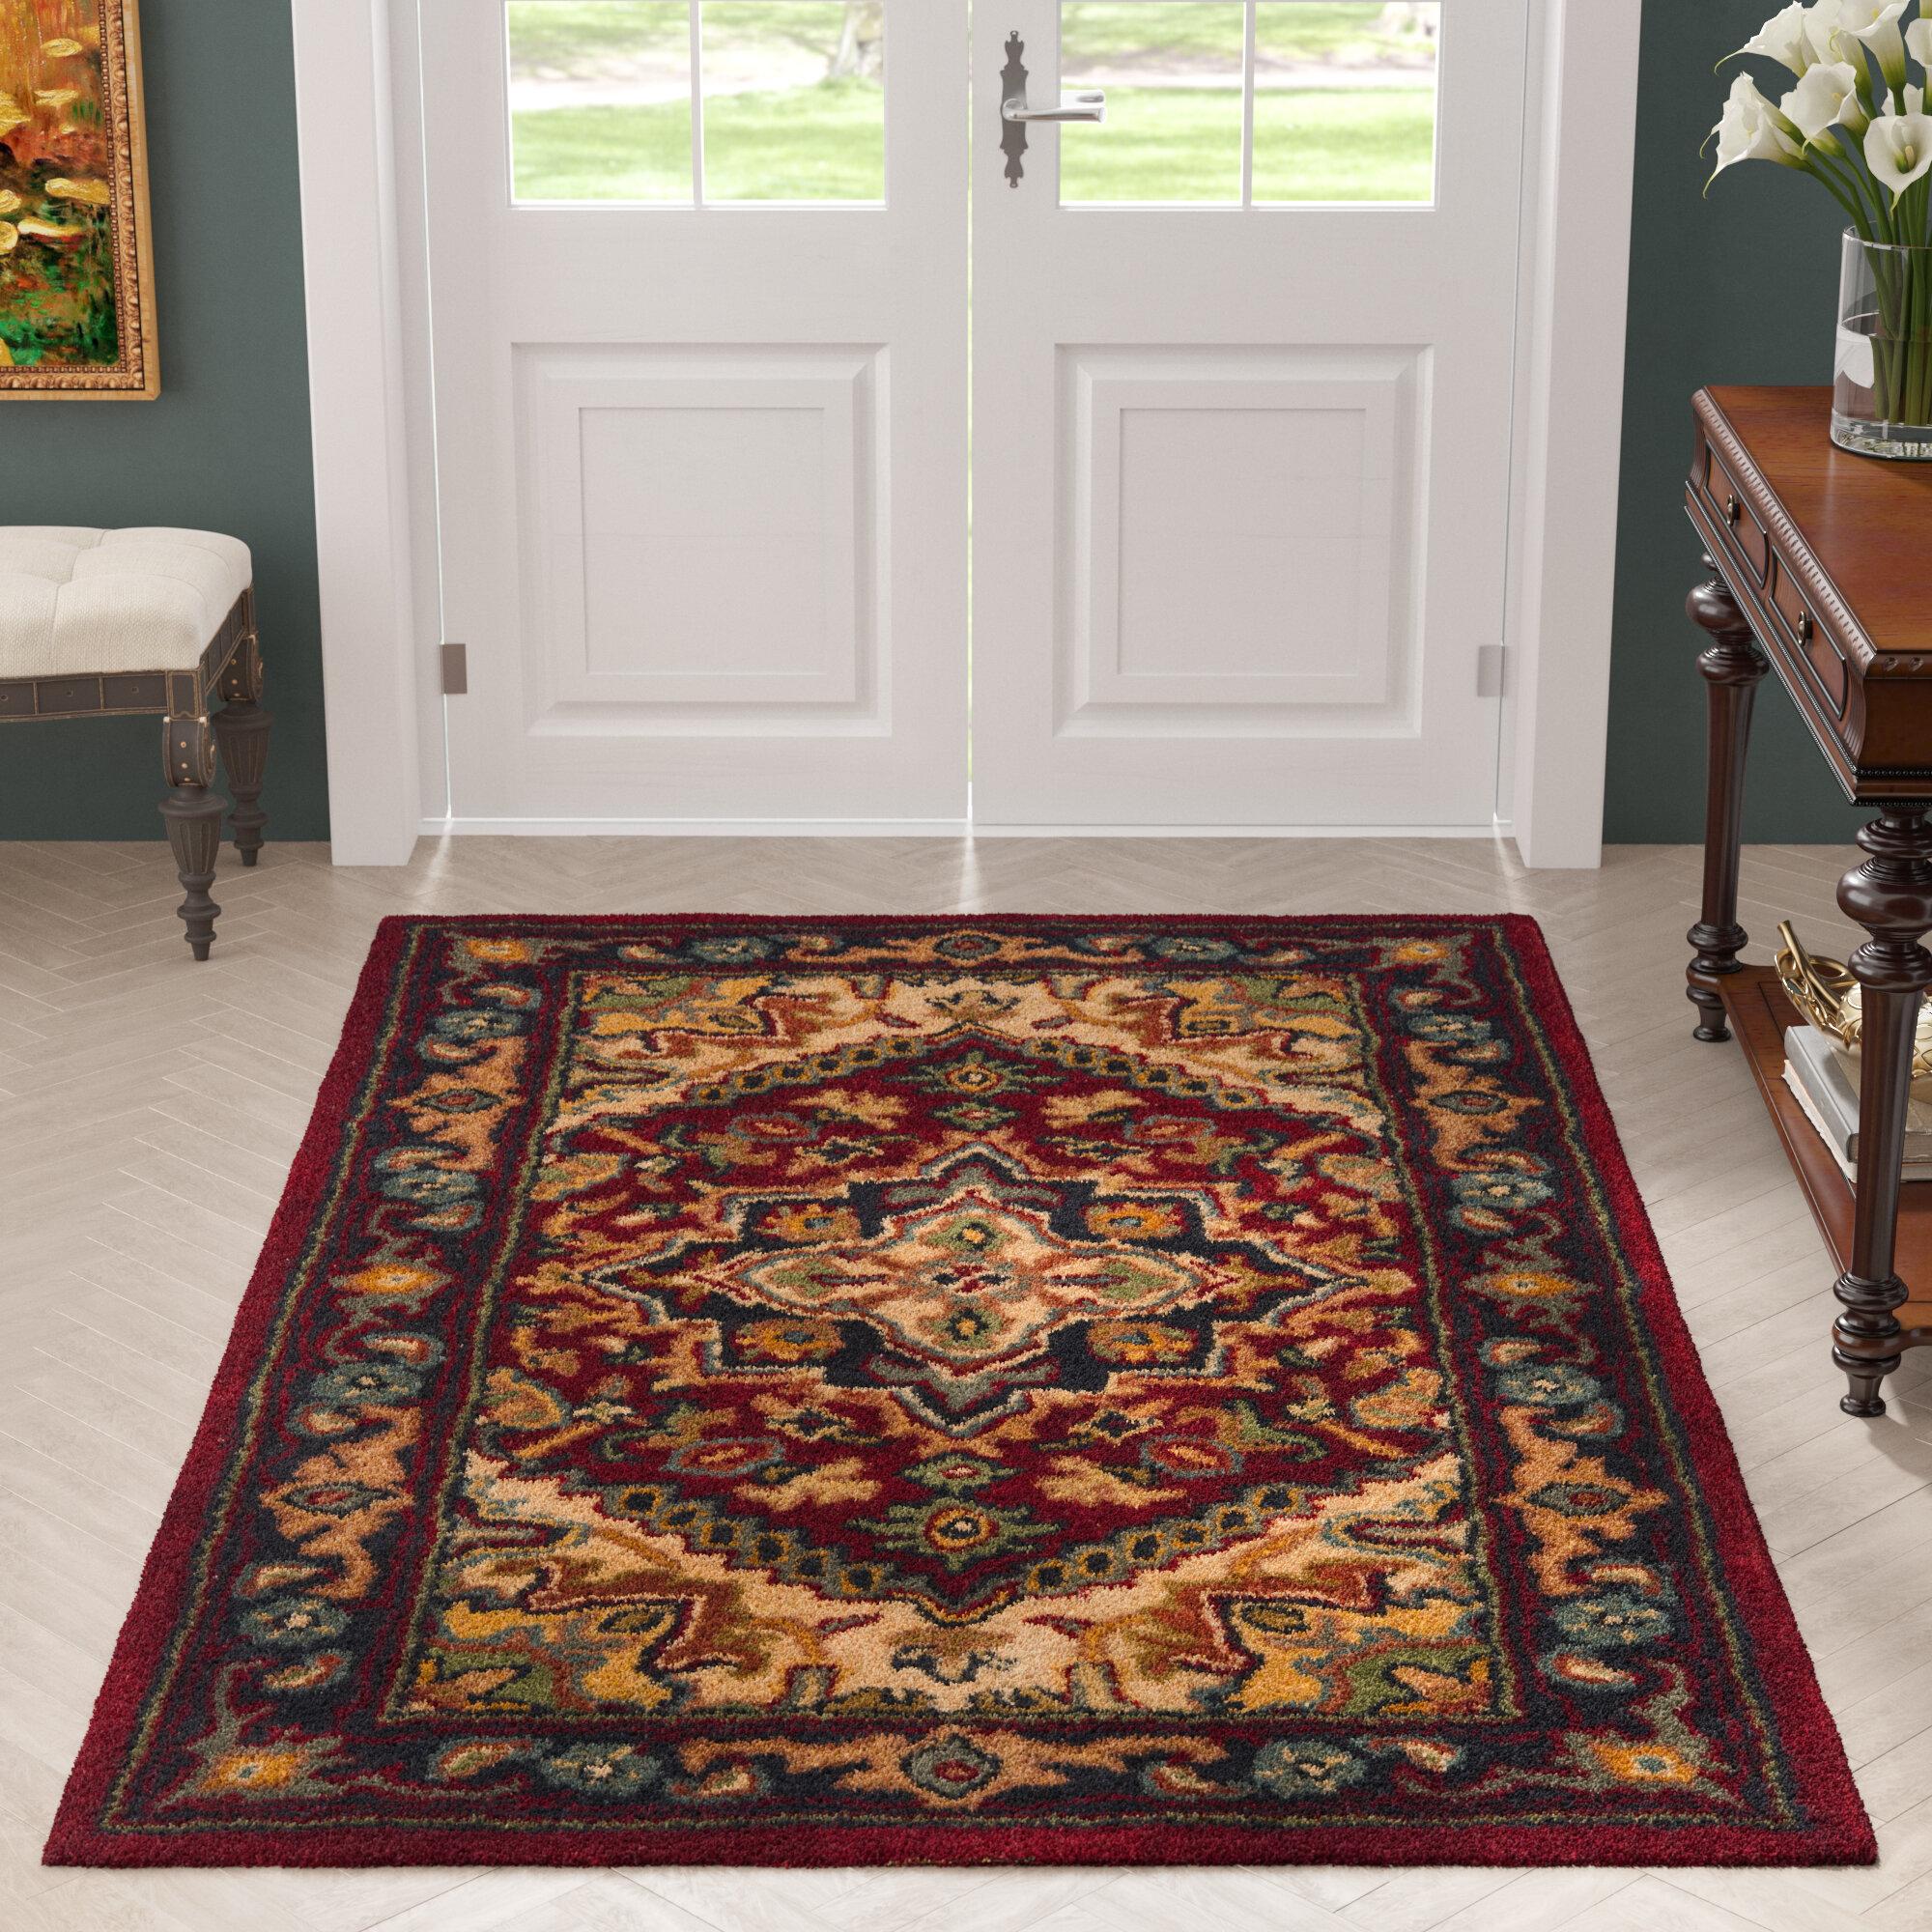 Astoria grand balthrop red oriental area rug reviews wayfair